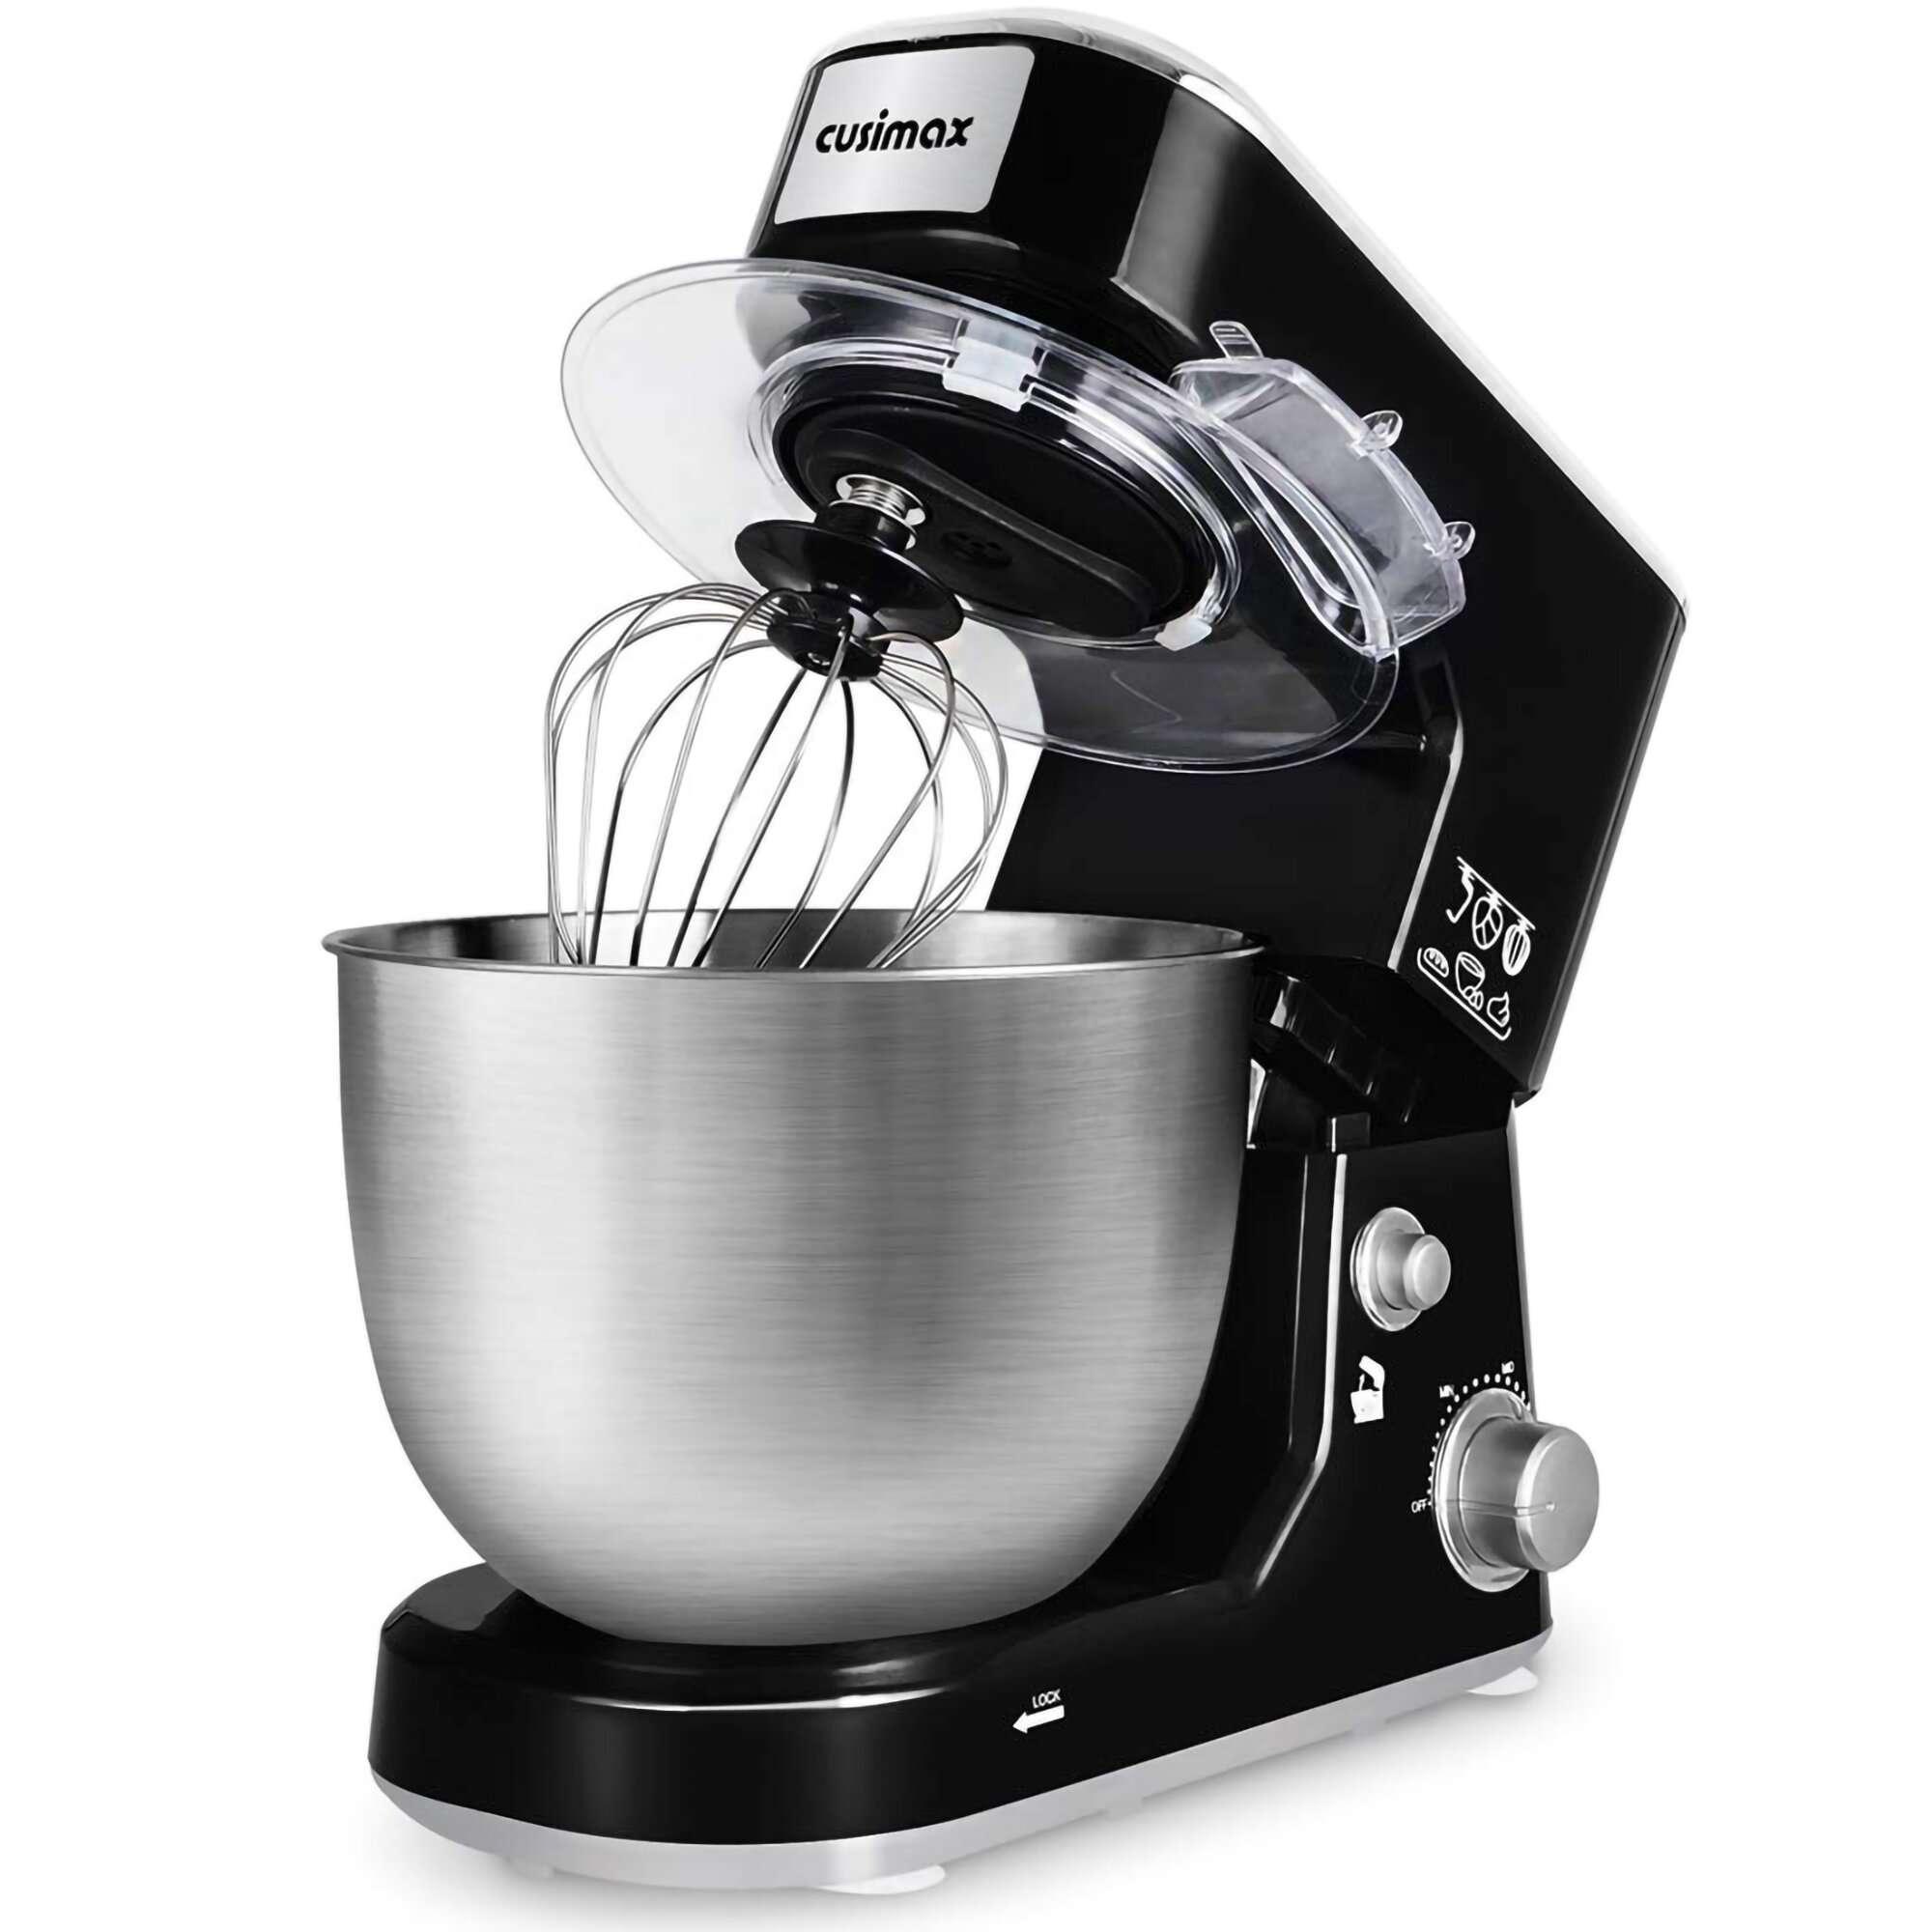 Cusimax Dough Mixer 3 Speed 5 Qt. Stand Mixer